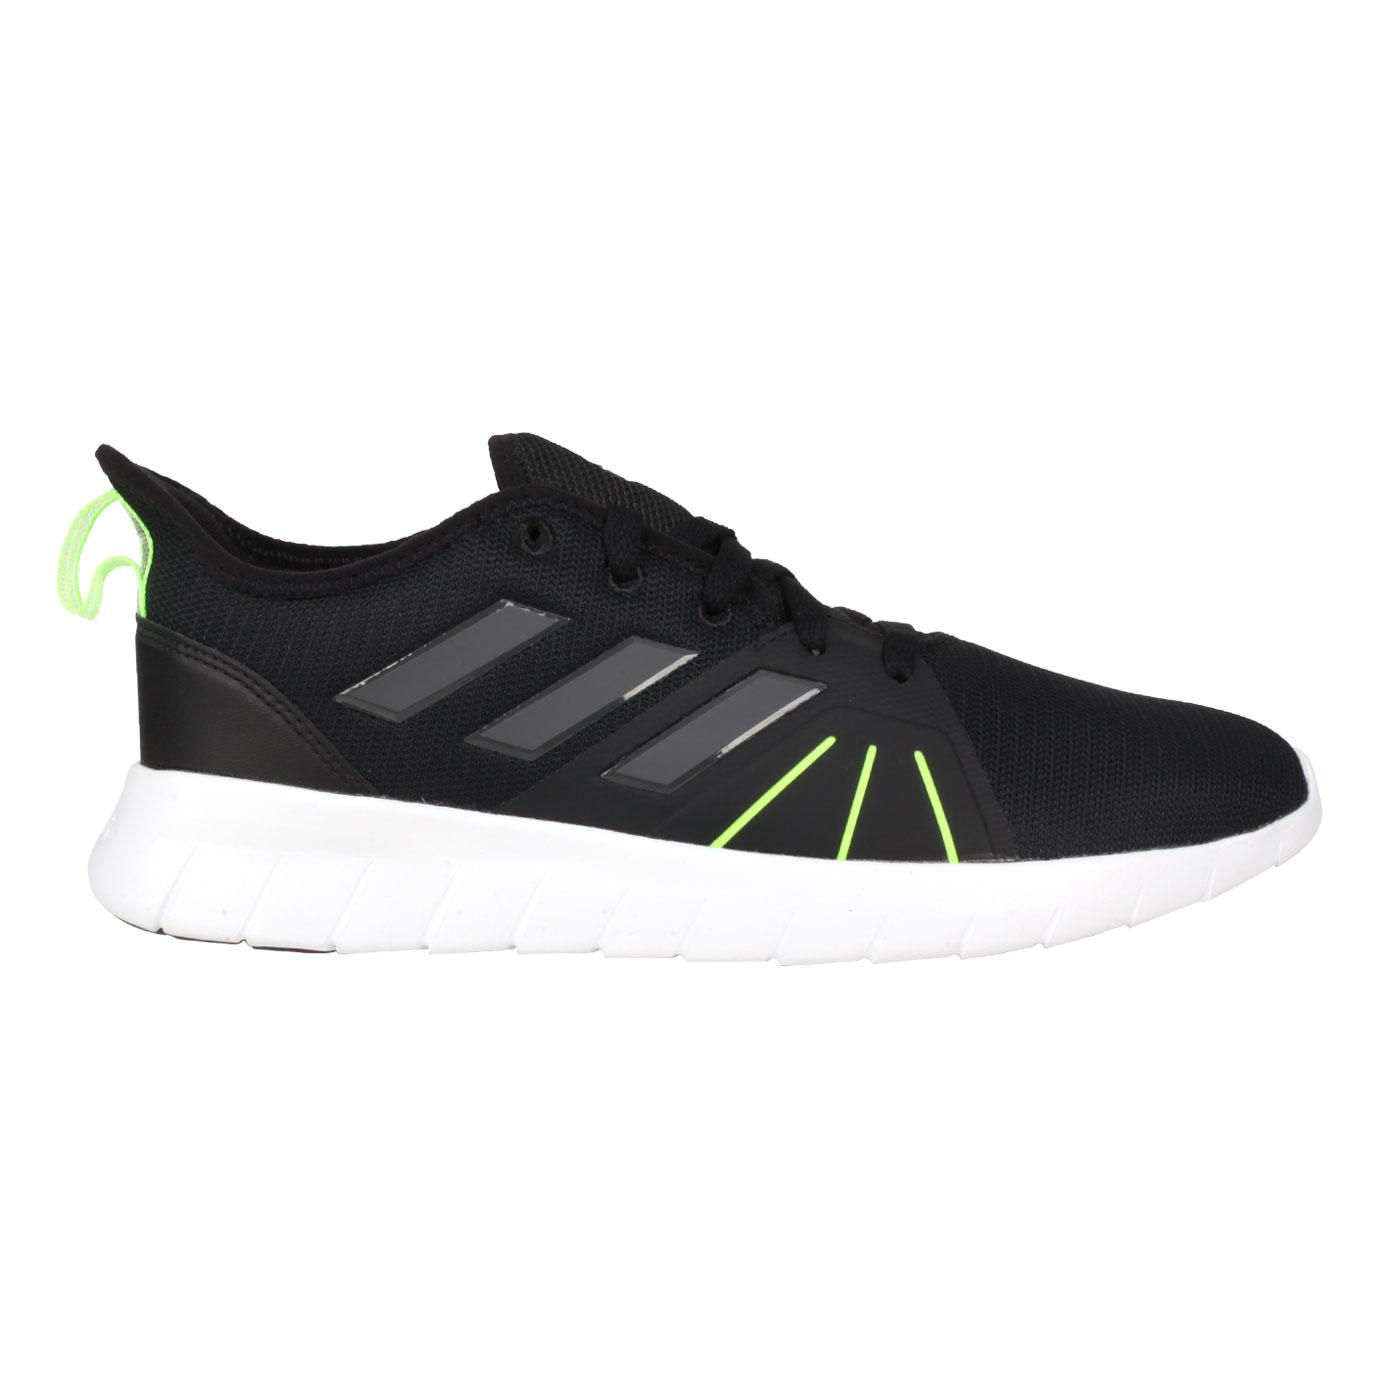 ADIDAS 男款運動慢跑鞋  @ASWEERUN 2.0@FW1683 - 黑螢光綠